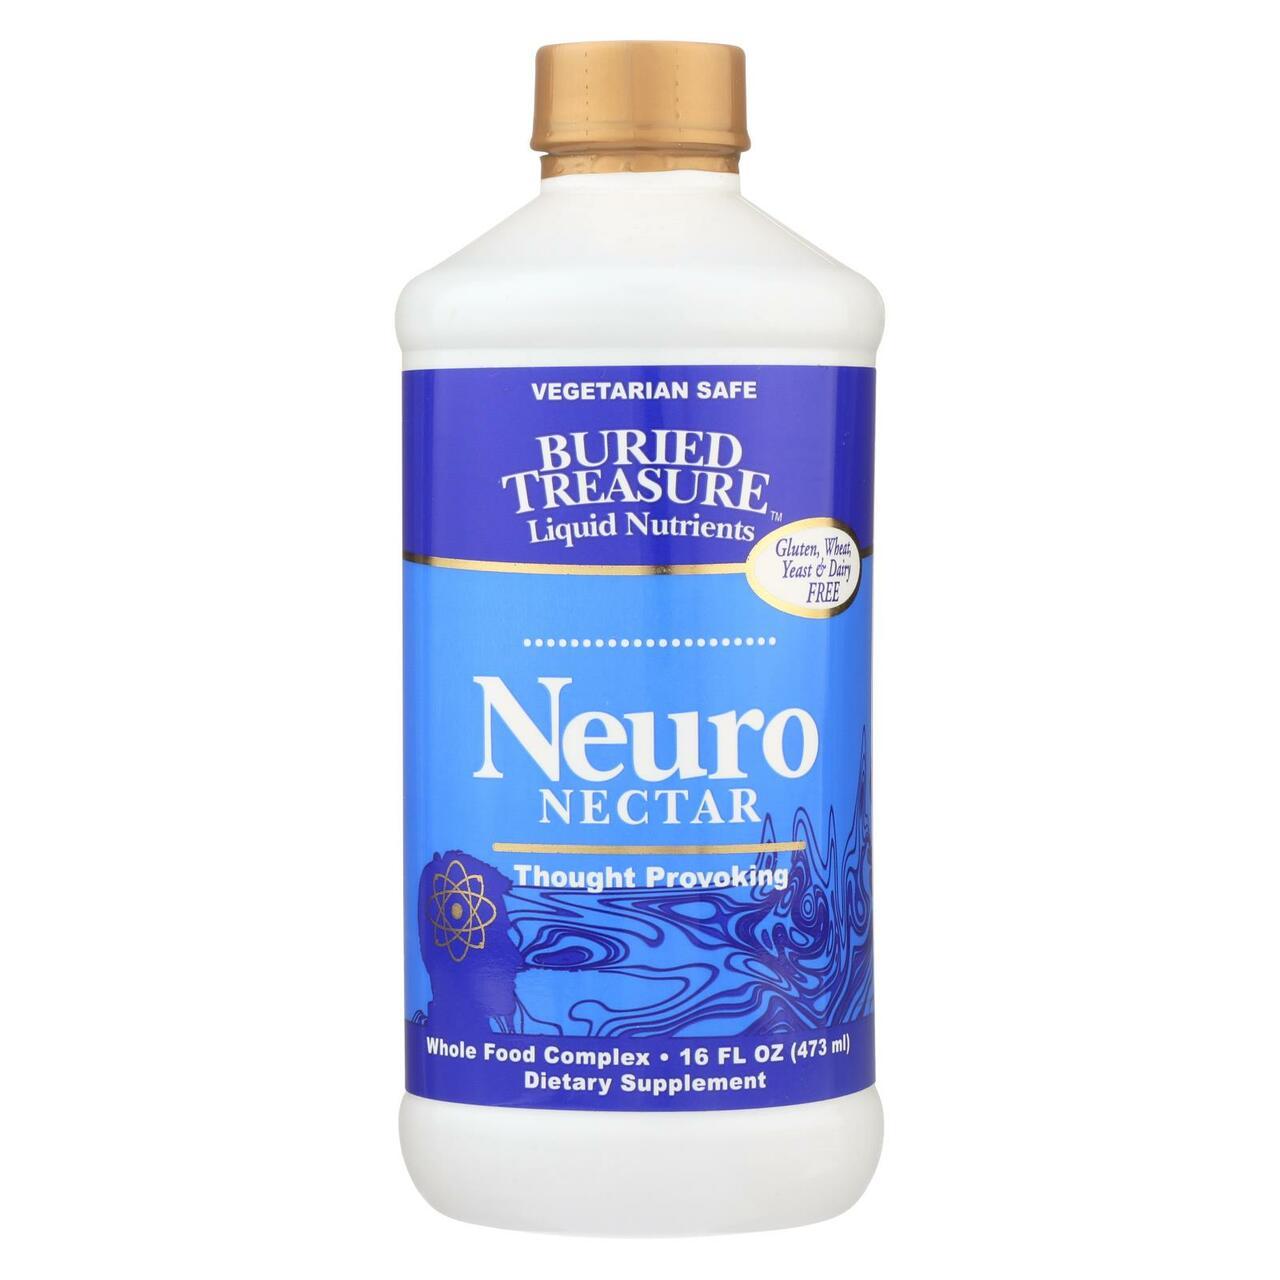 Image of Neuro Nectar Liquid